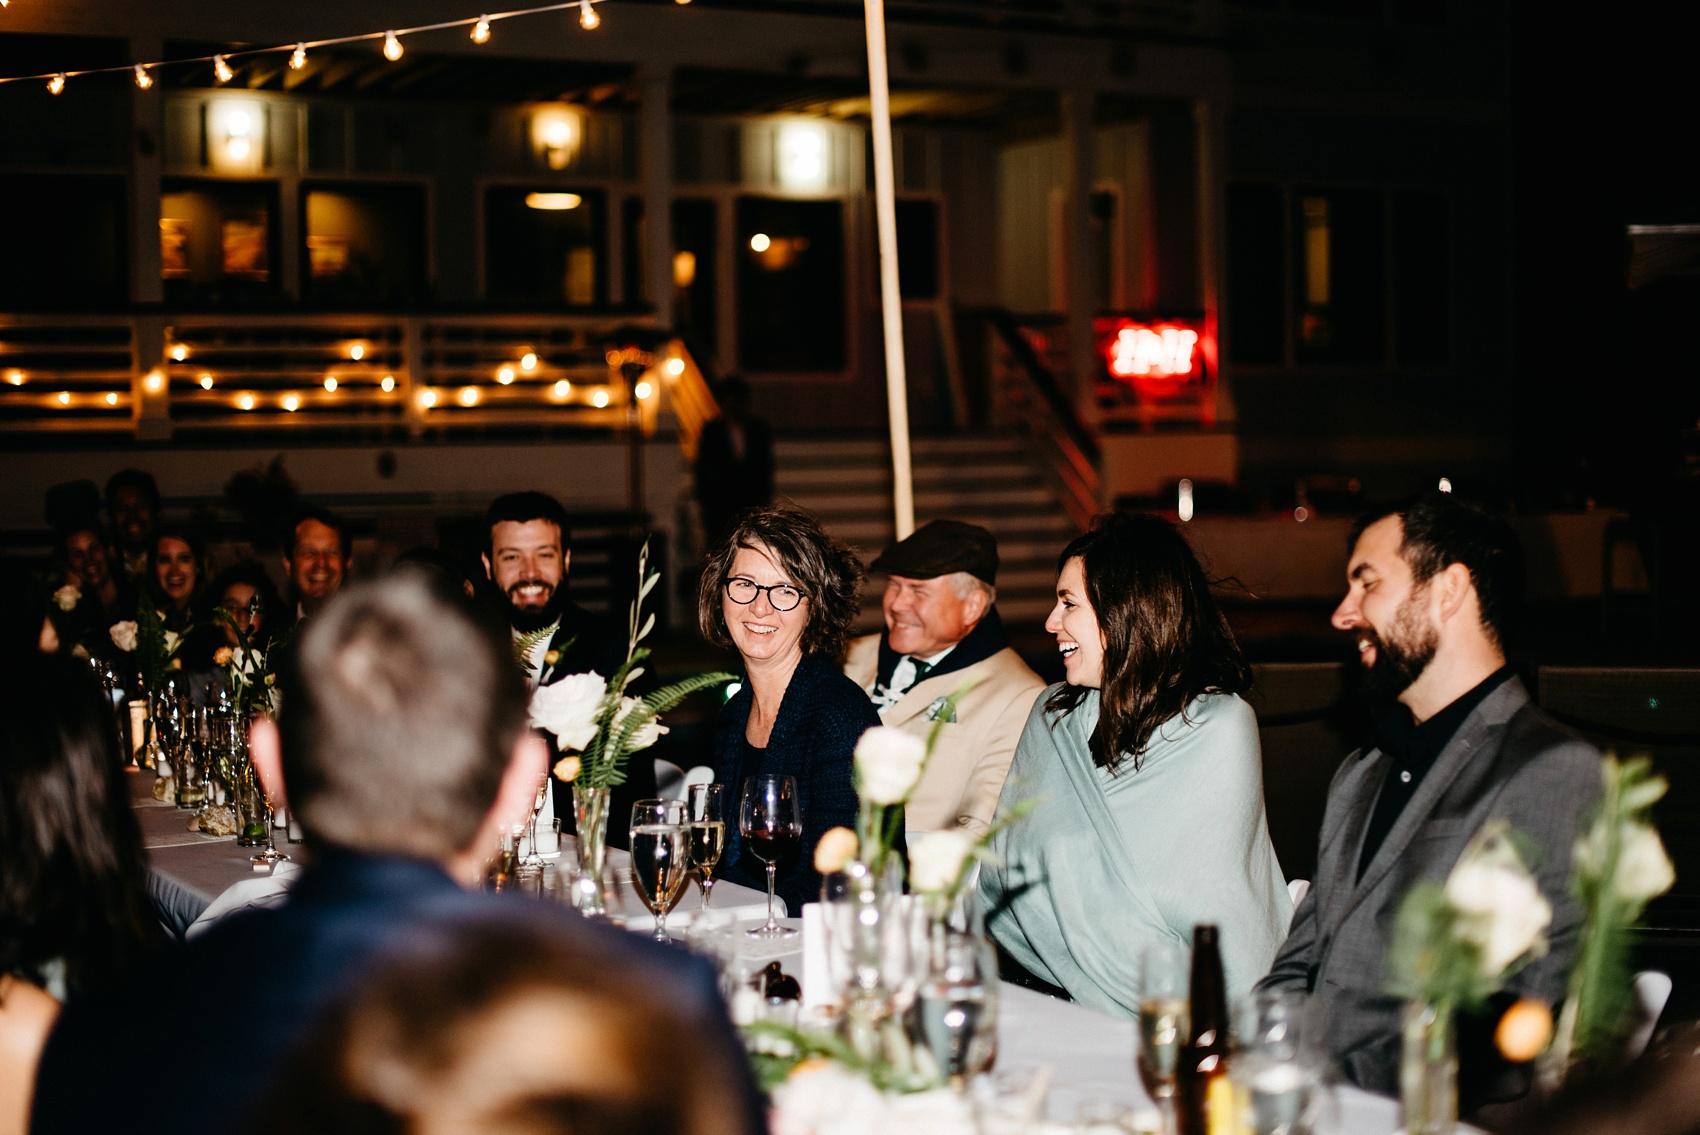 outerbanks_wedding_photographer_1336.jpg